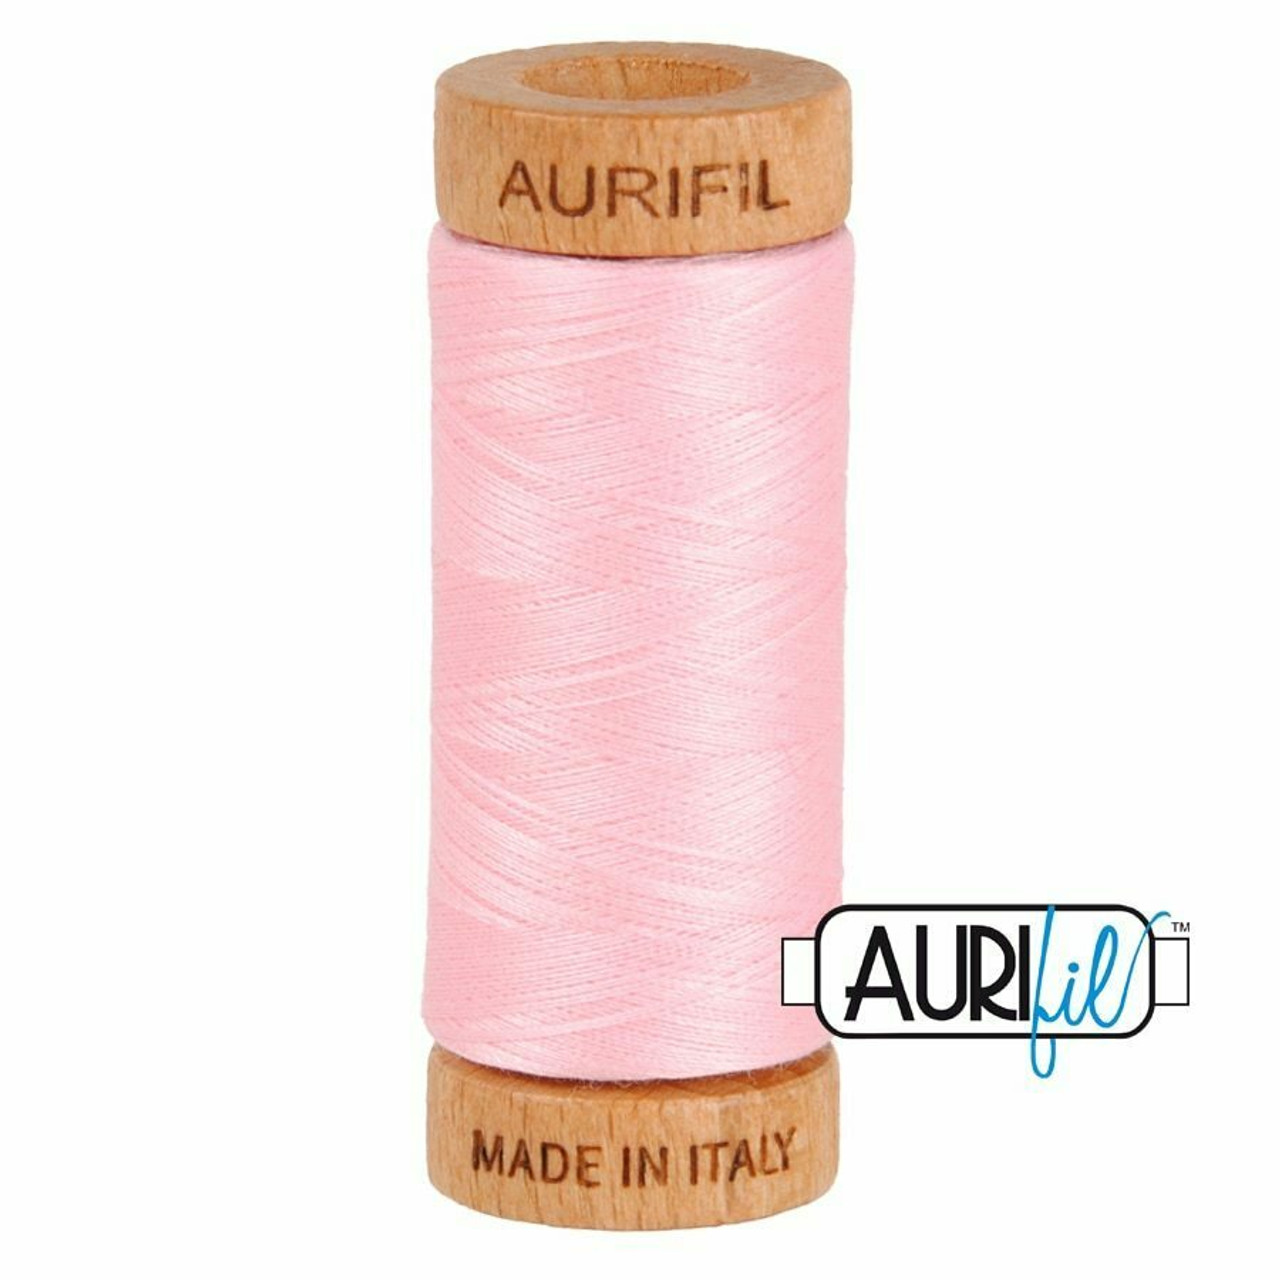 Aurifil 80wt 2423 - Baby Pink